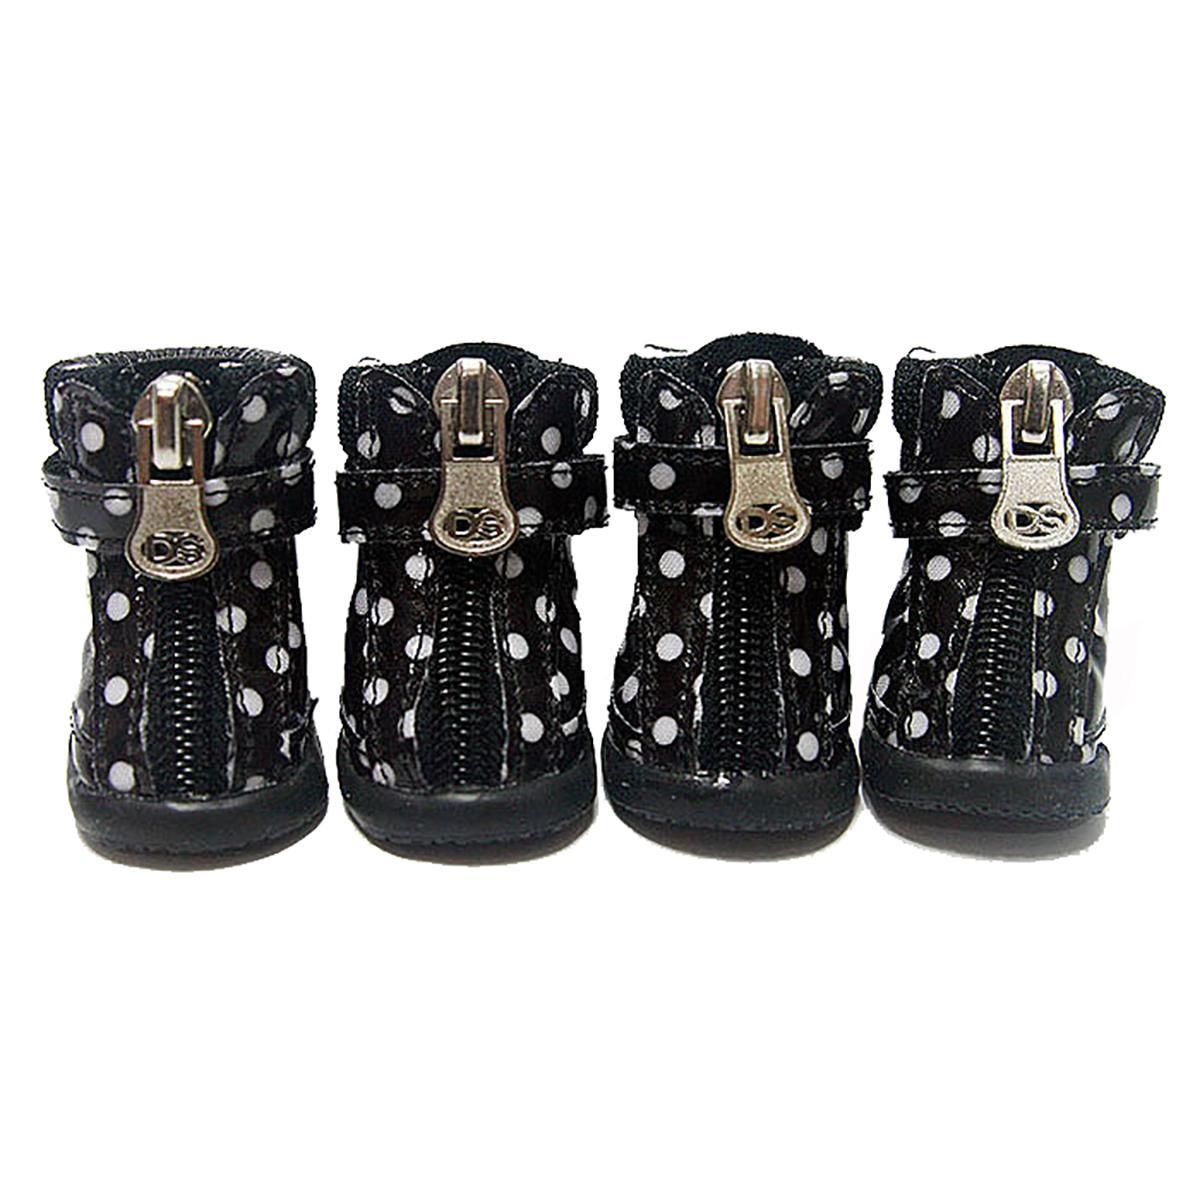 Polka Dot Hiker Dog Boots - Black